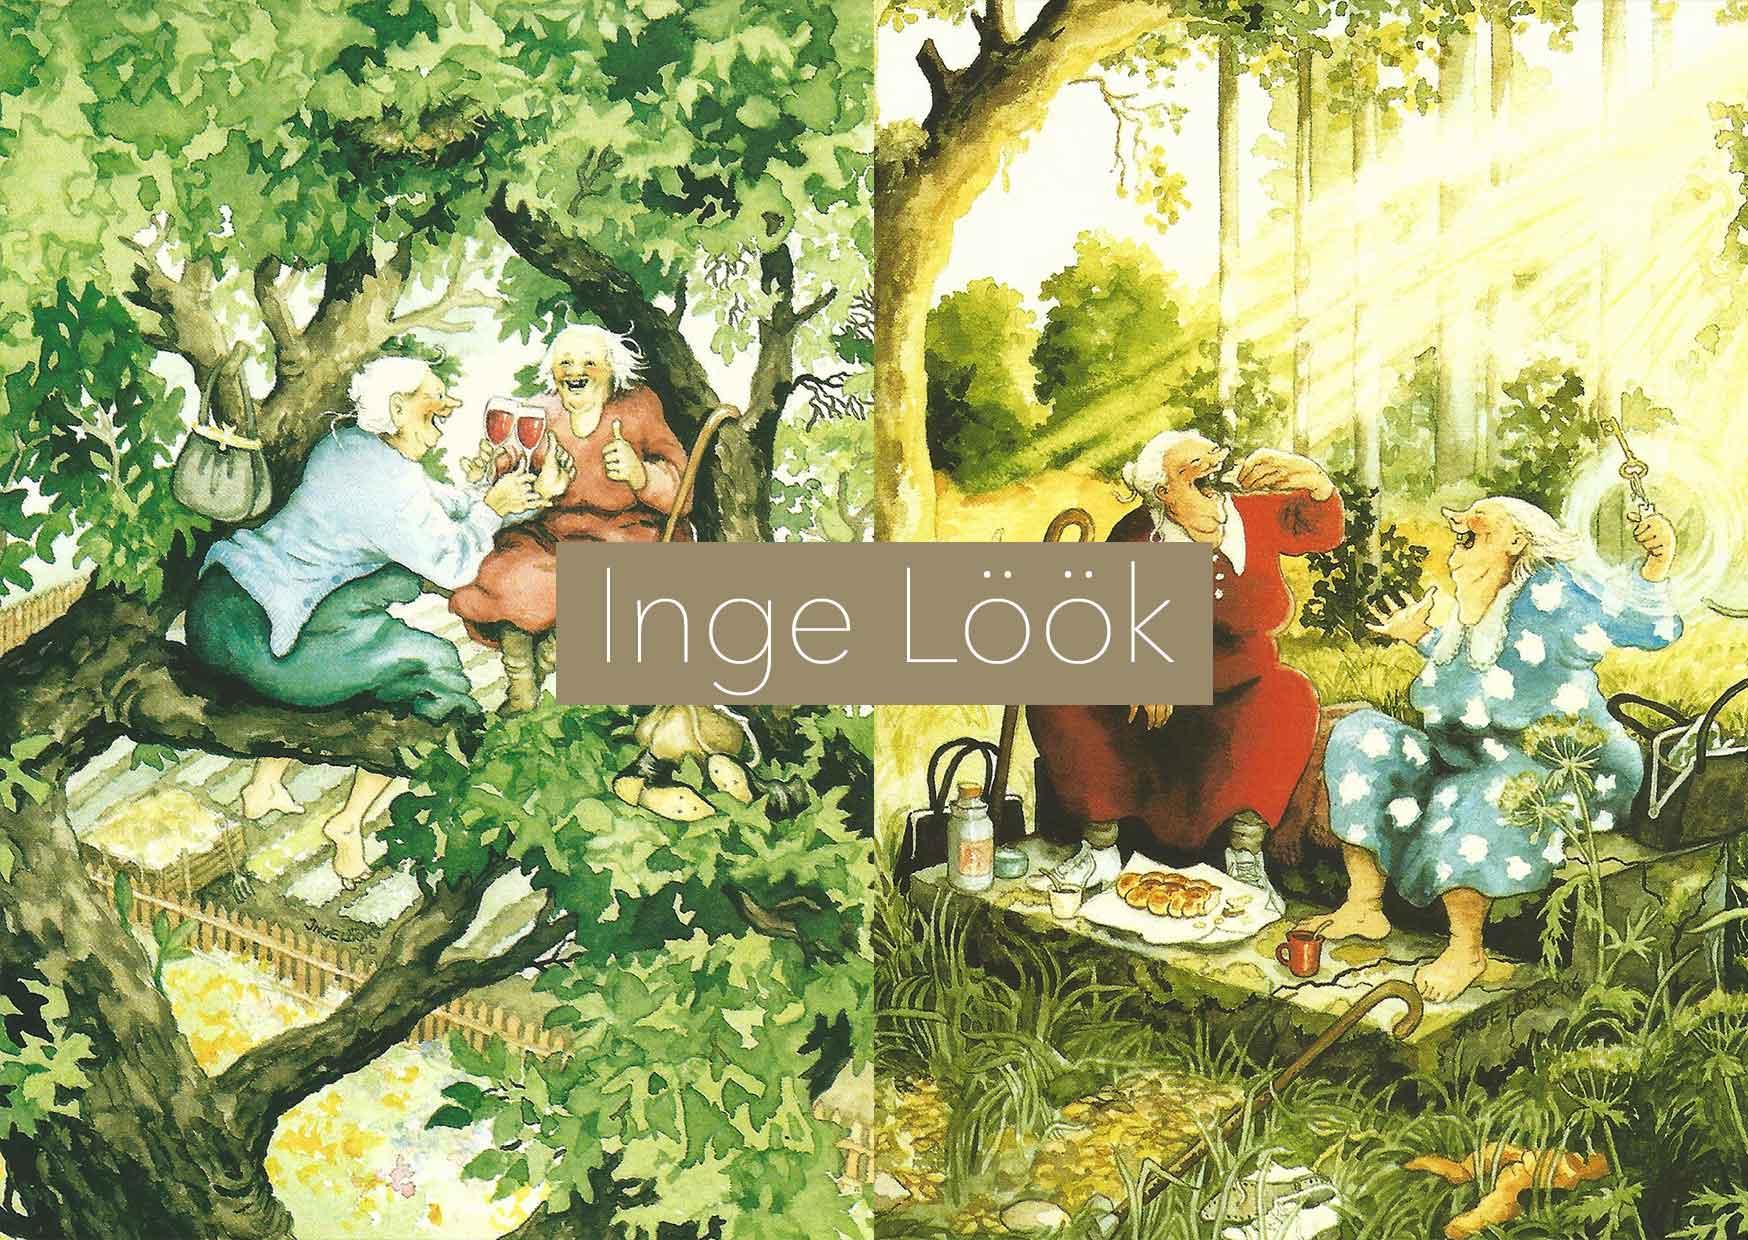 Inge-Look-banner-def